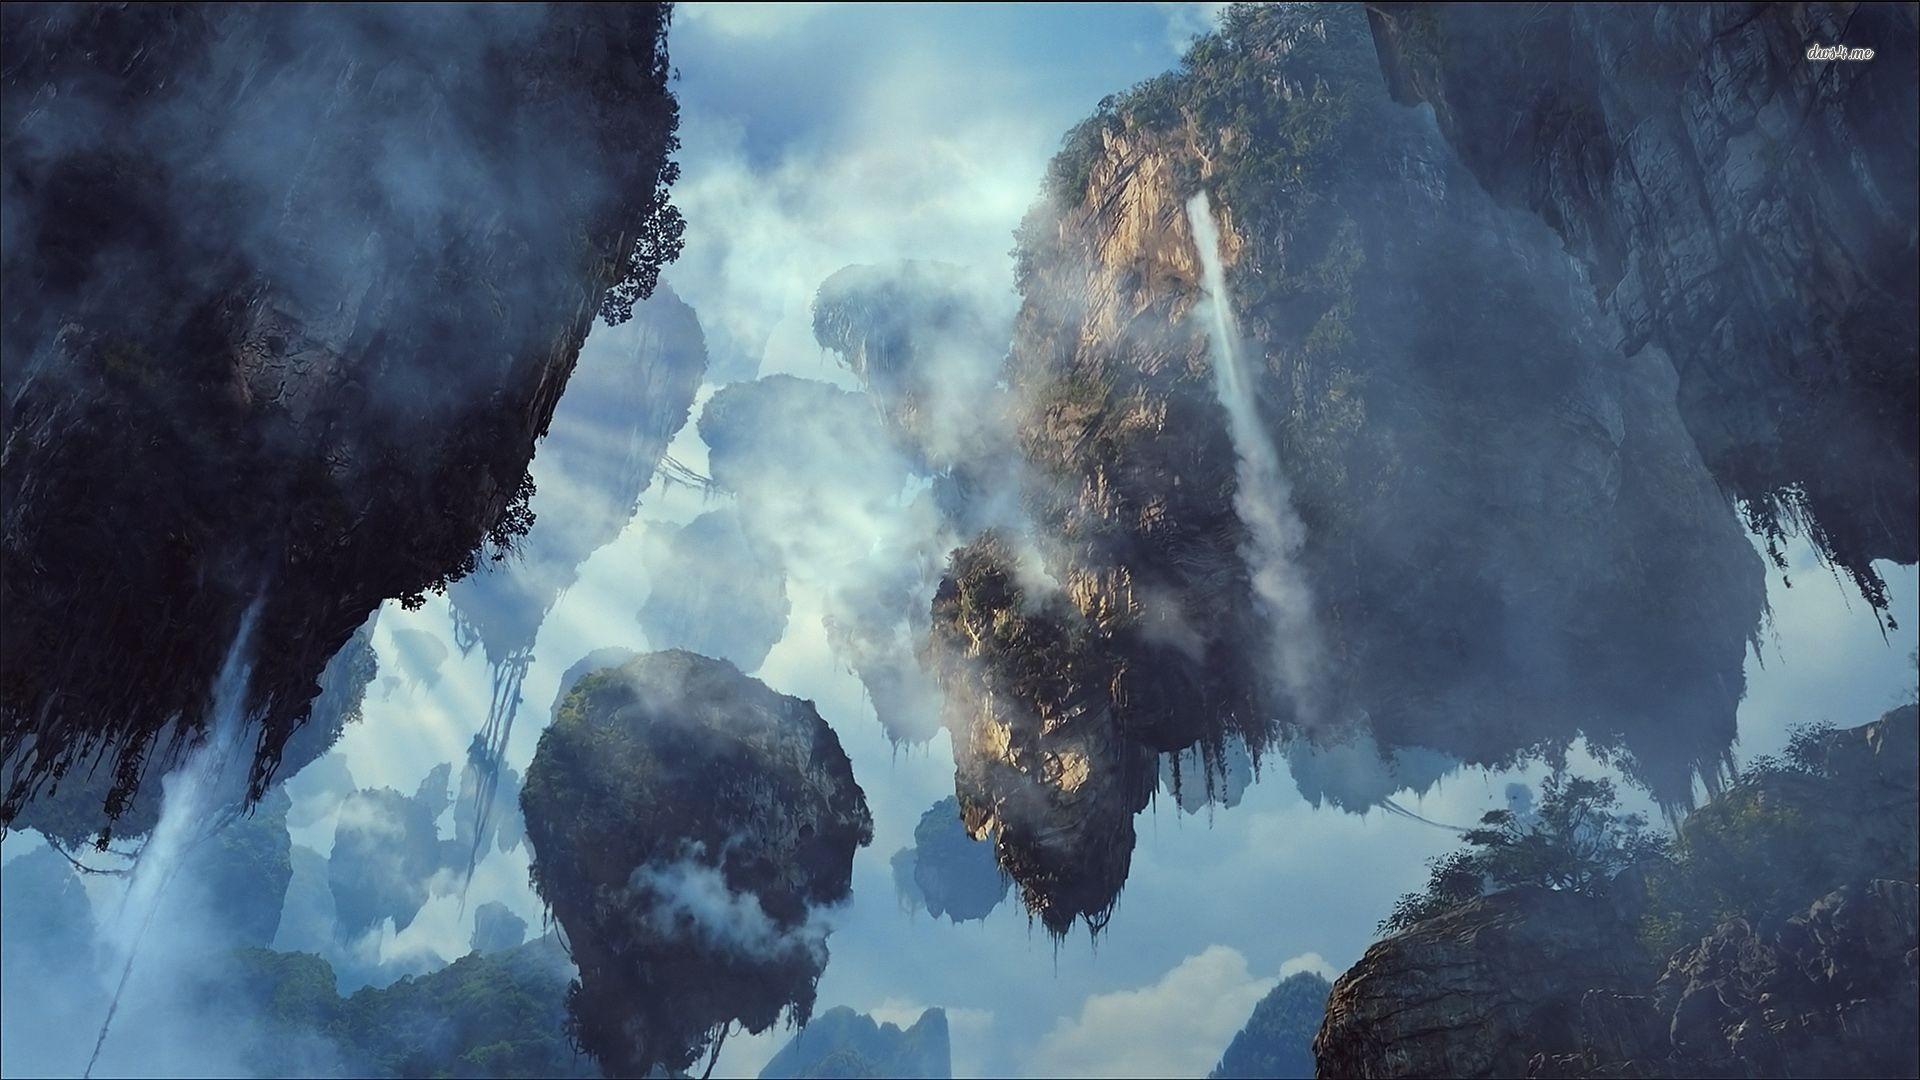 Res: 1920x1080, ... Avatar - Hallelujah Mountains wallpaper ...